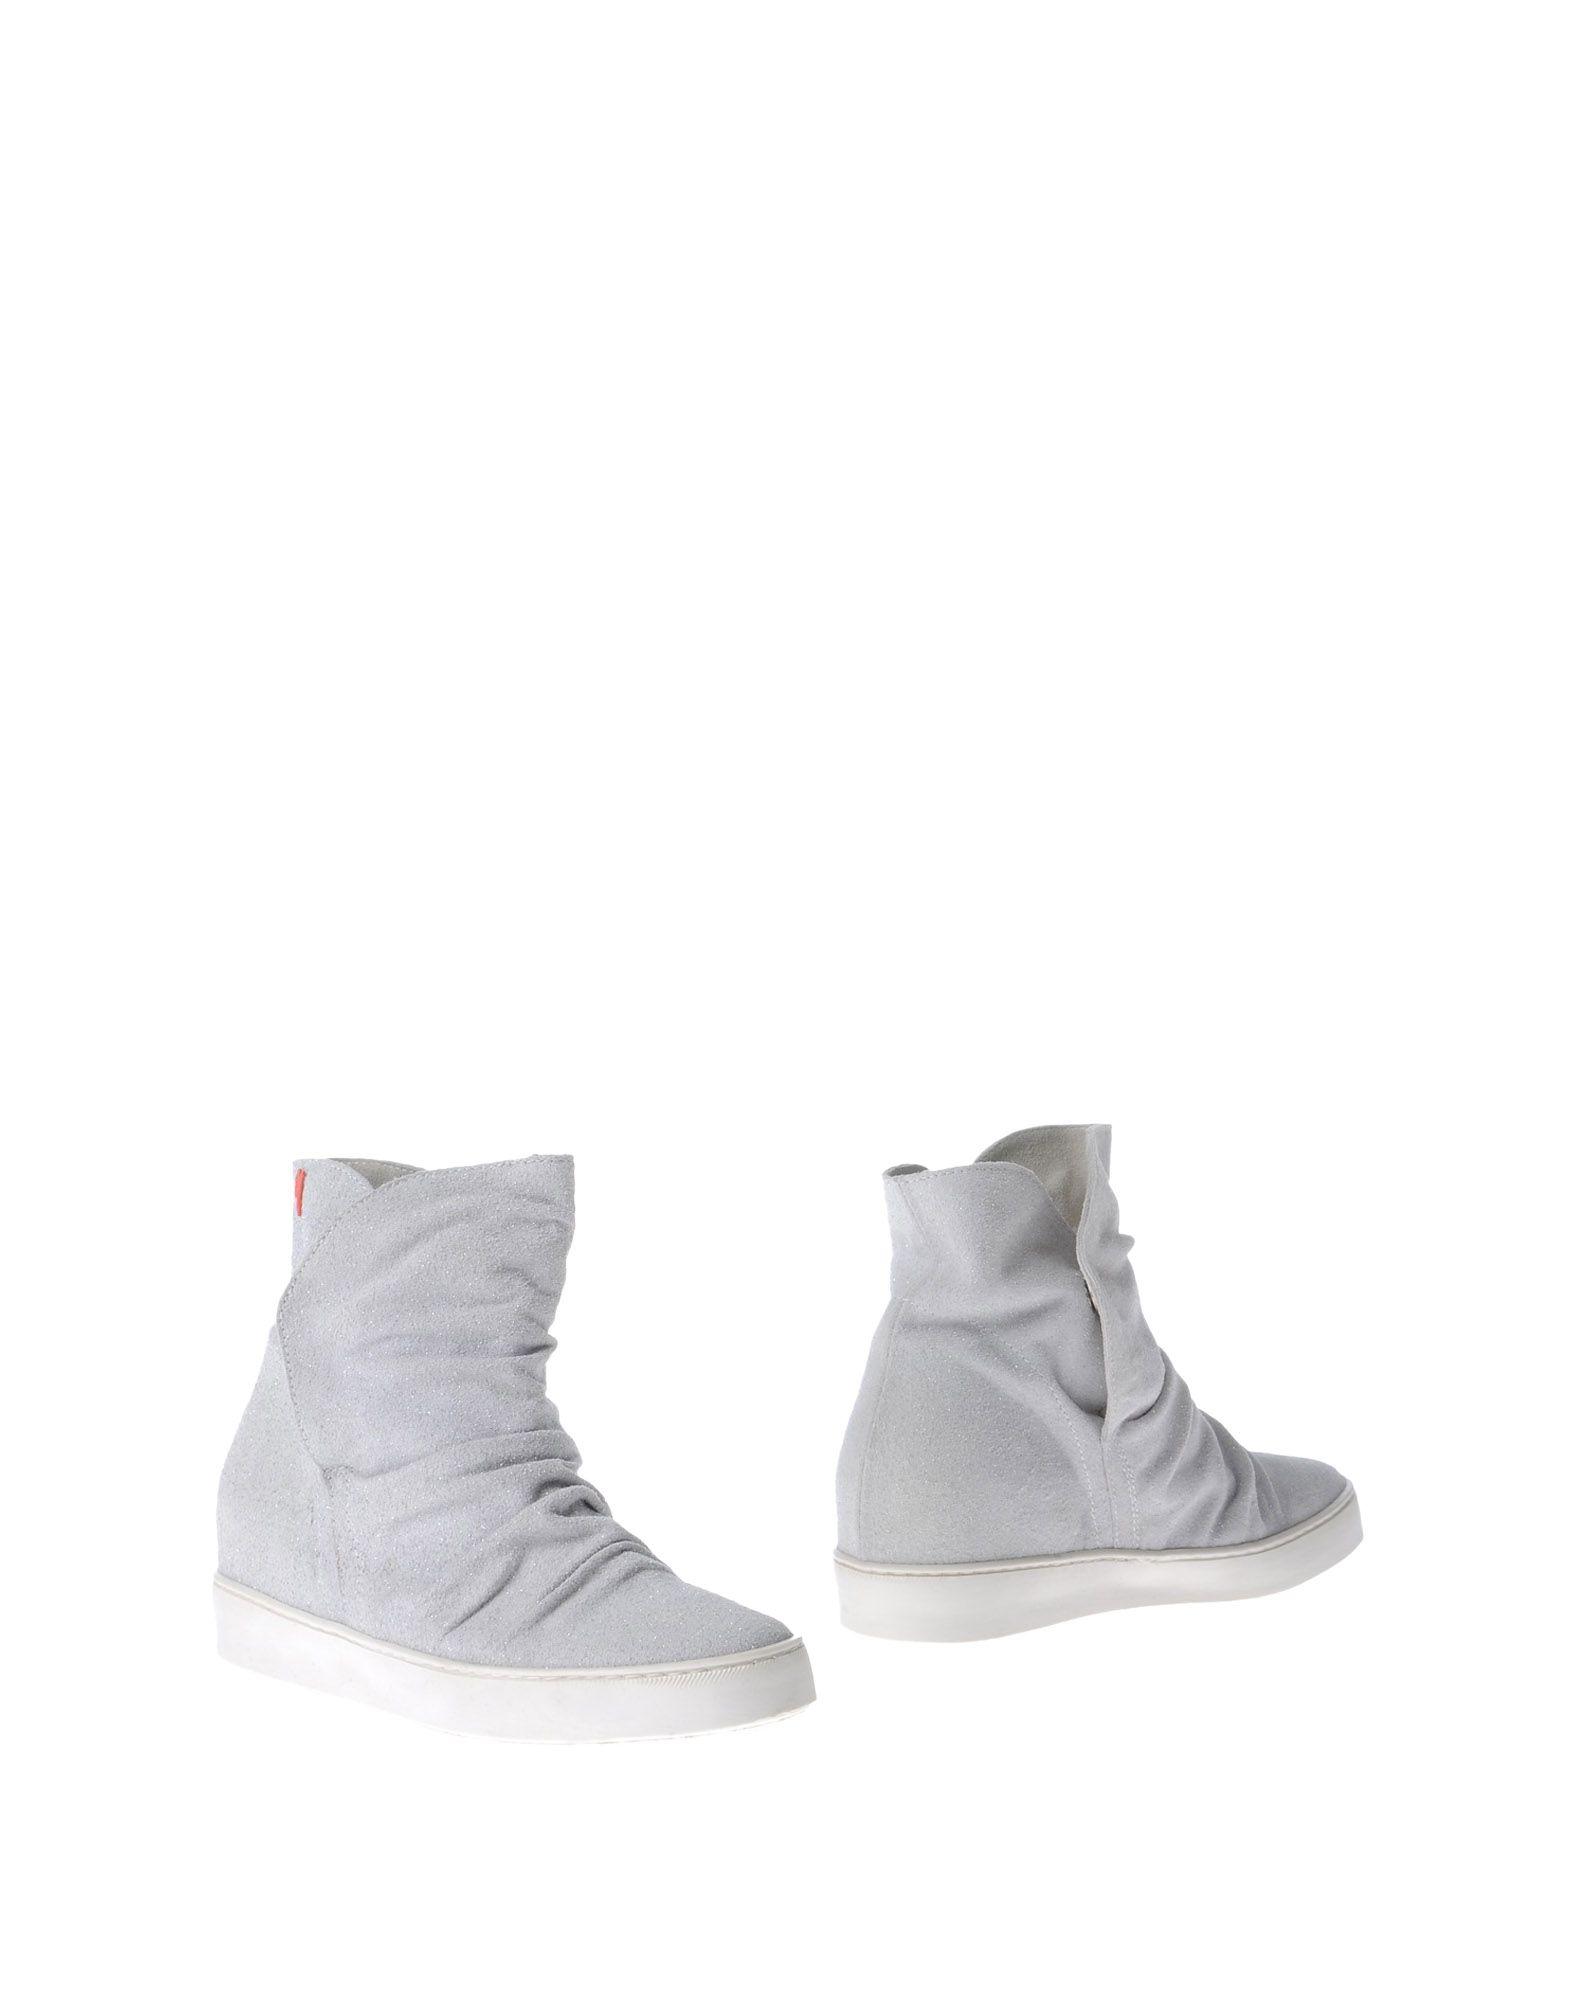 Stilvolle billige Schuhe Damen Manila Grace Denim Stiefelette Damen Schuhe  44937114UR 7de0b0